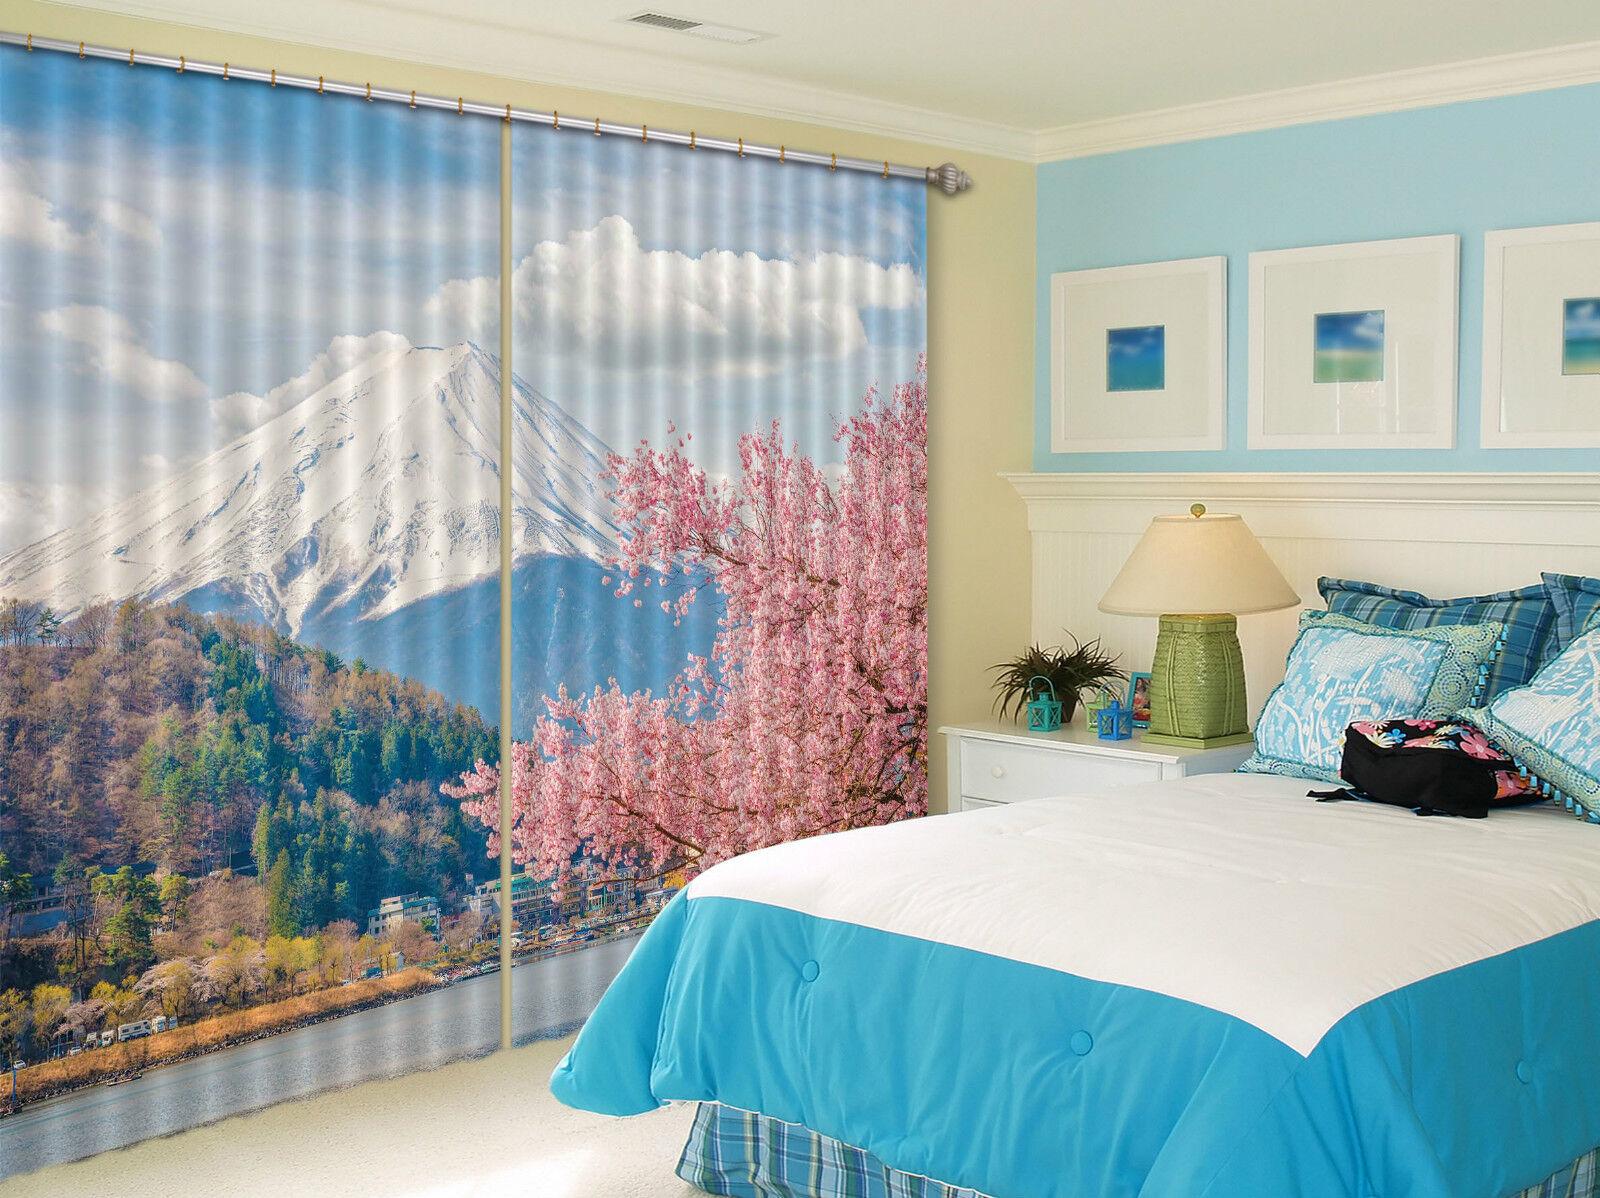 3D Monte Fuji 8 Cortinas de impresión de cortina de foto Blockout Tela Cortinas Ventana CA